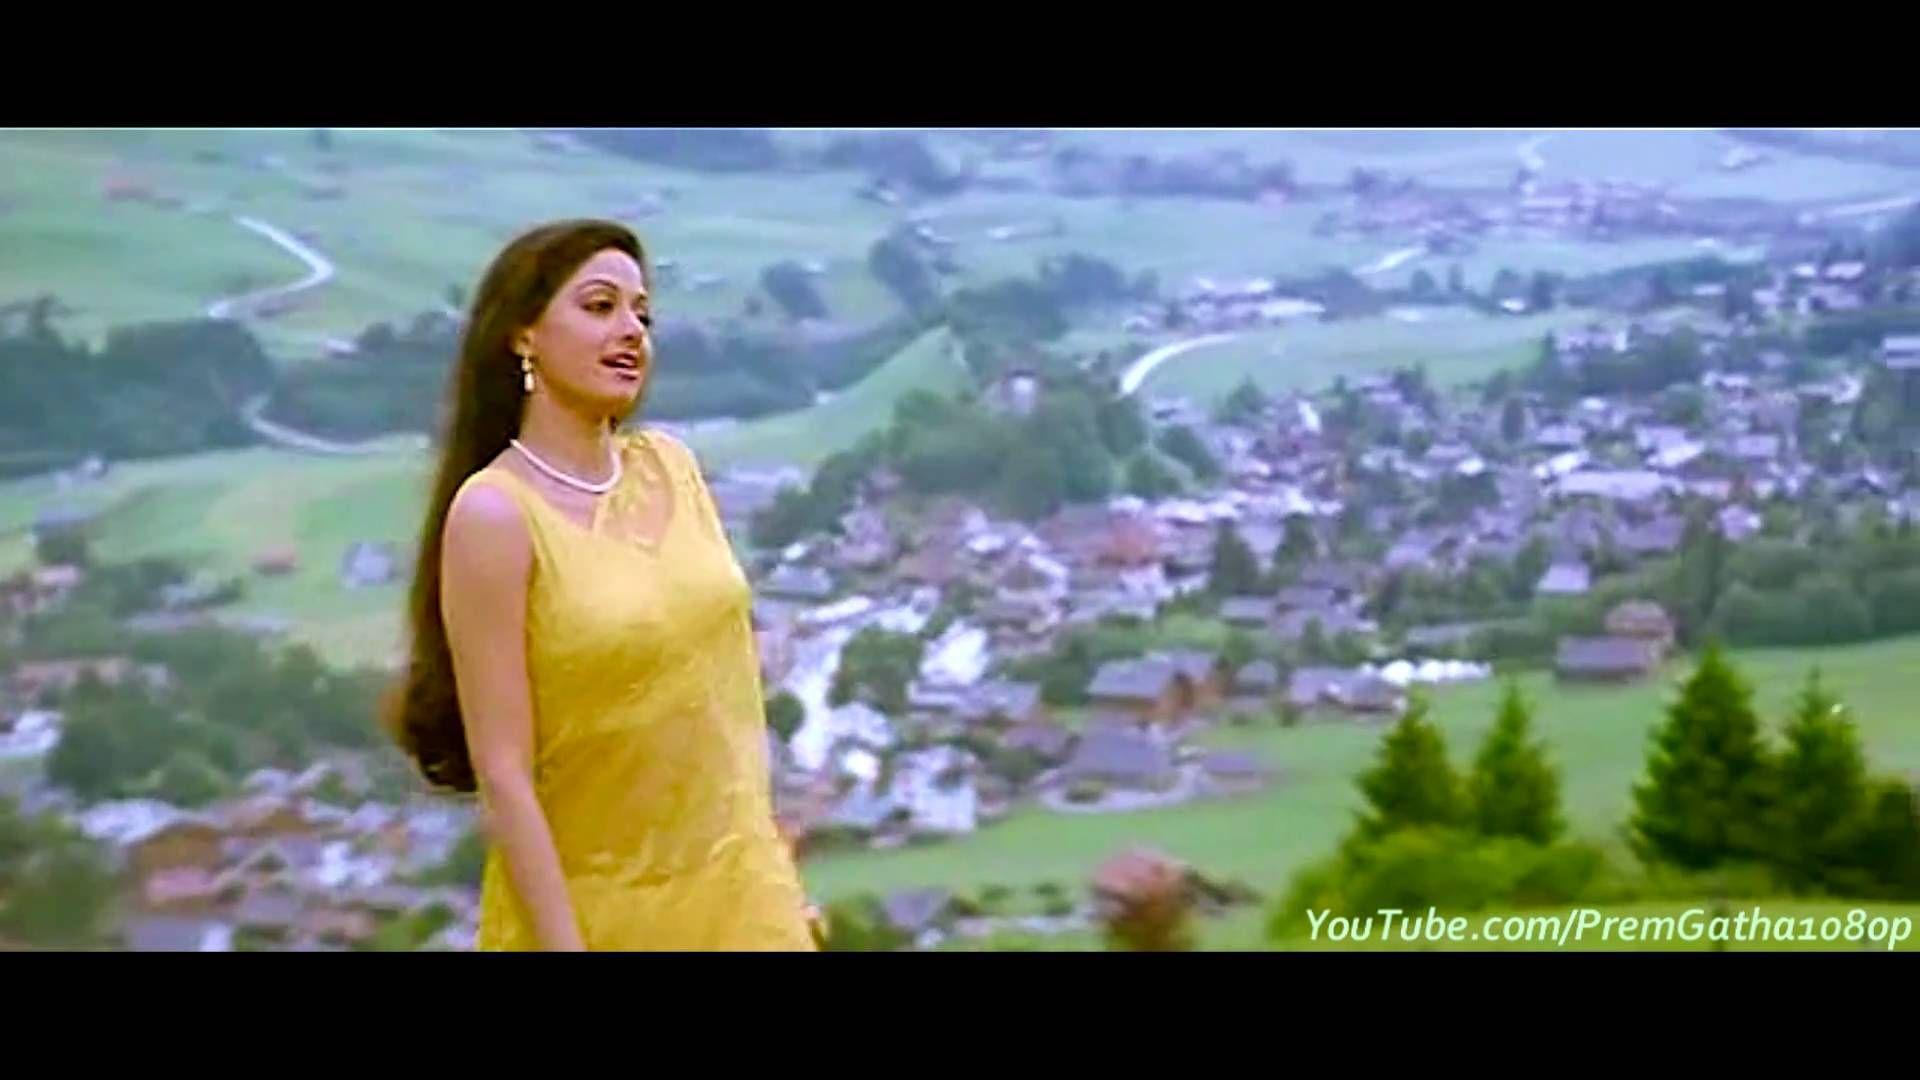 Tere Mere Hoton Pe (Mitwa) - Chandni (1080p HD Song) | For